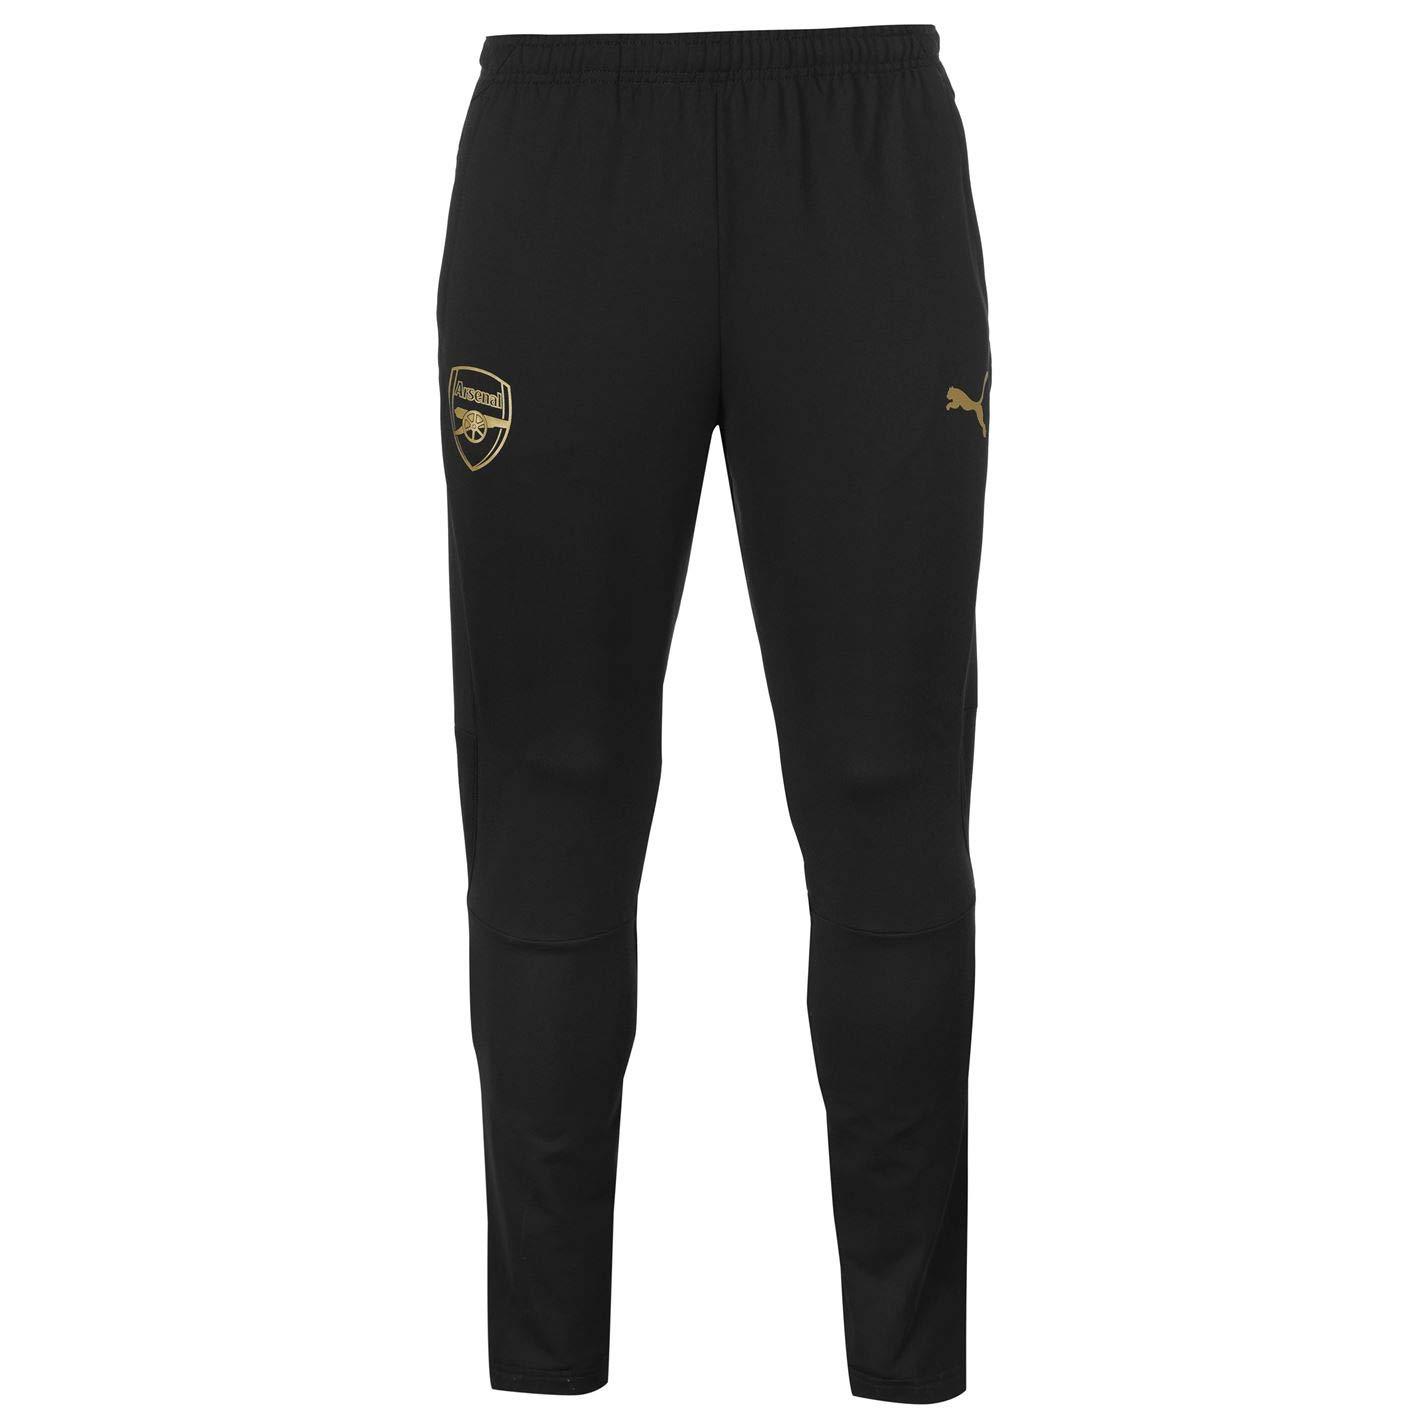 Puma Arsenal FC Training Pants with Zipped Pockets Chándal, Hombre ...